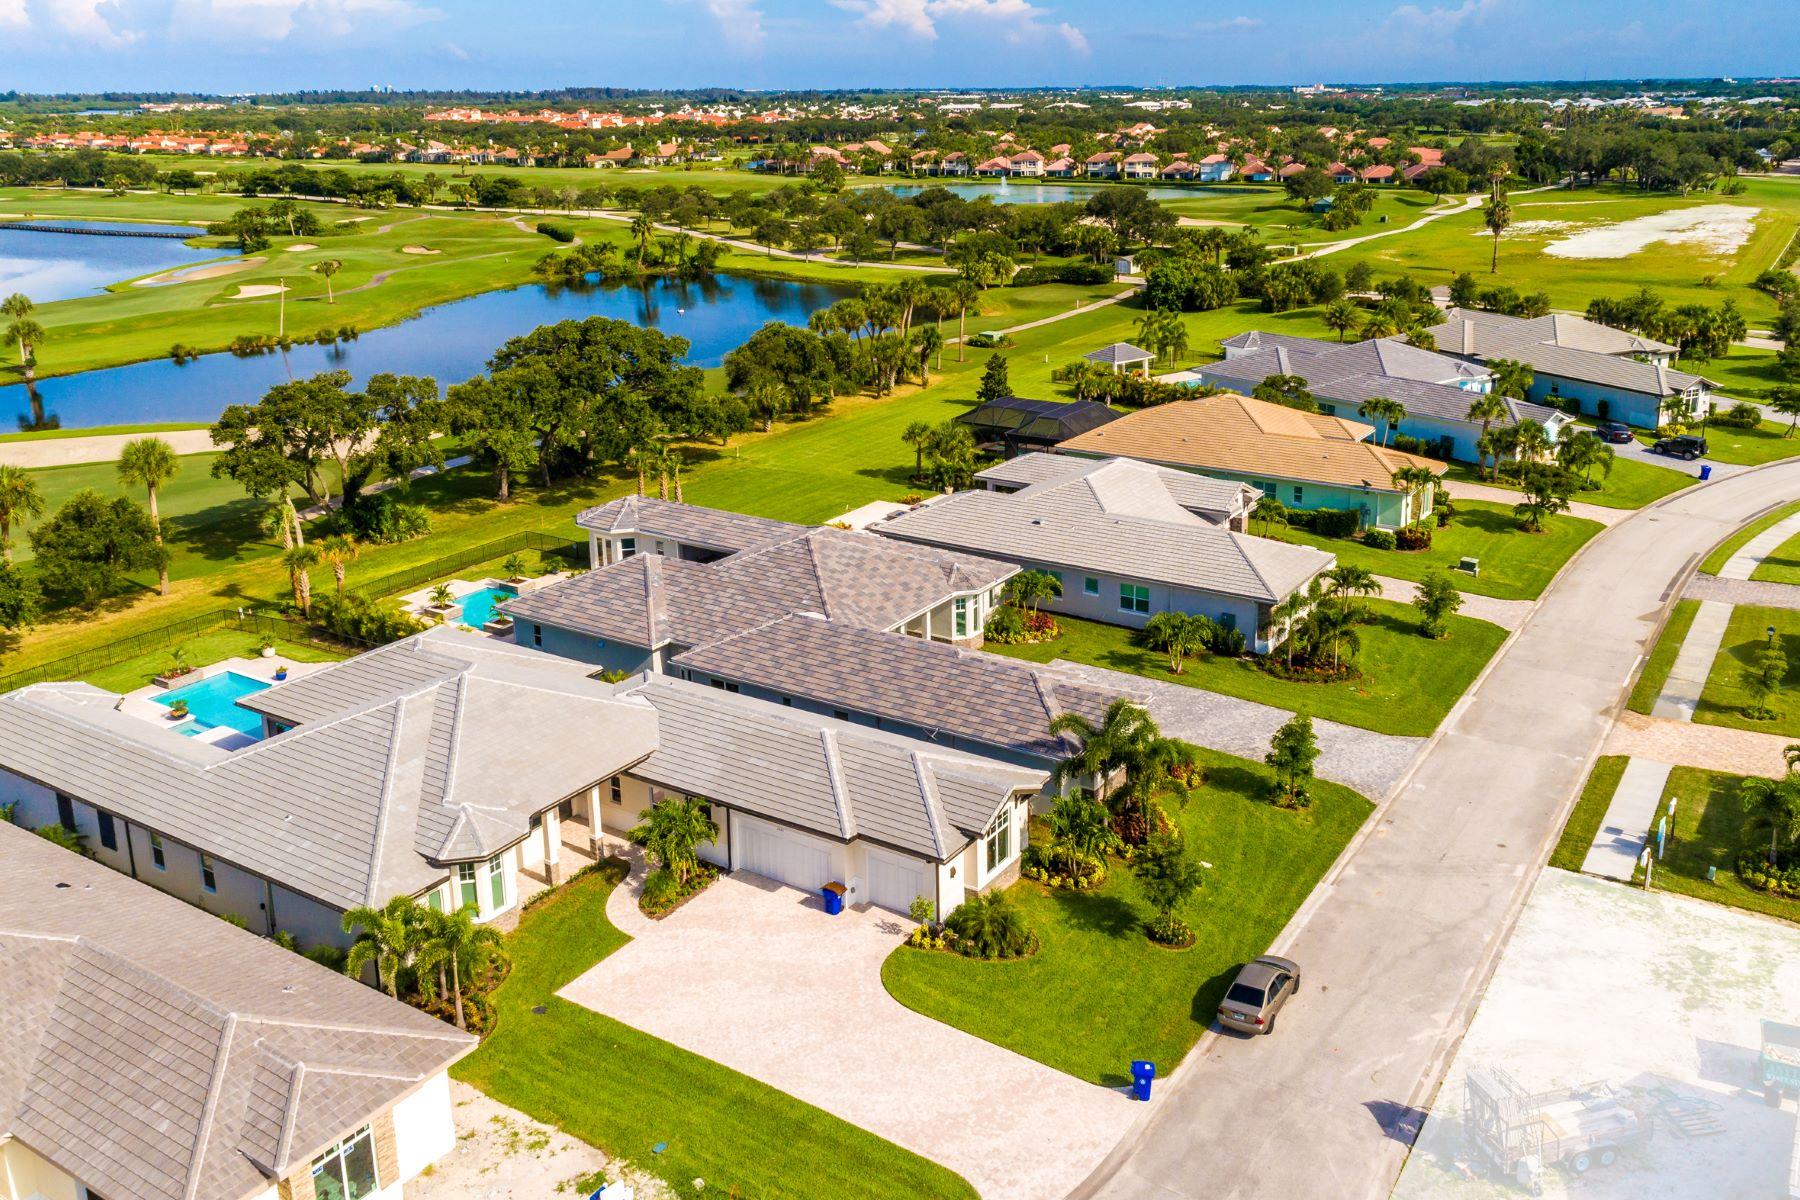 Additional photo for property listing at Luxury New Construction in Grand Harbor 2356 Grand Harbor Reserve Square Vero Beach, Florida 32967 Amerika Birleşik Devletleri